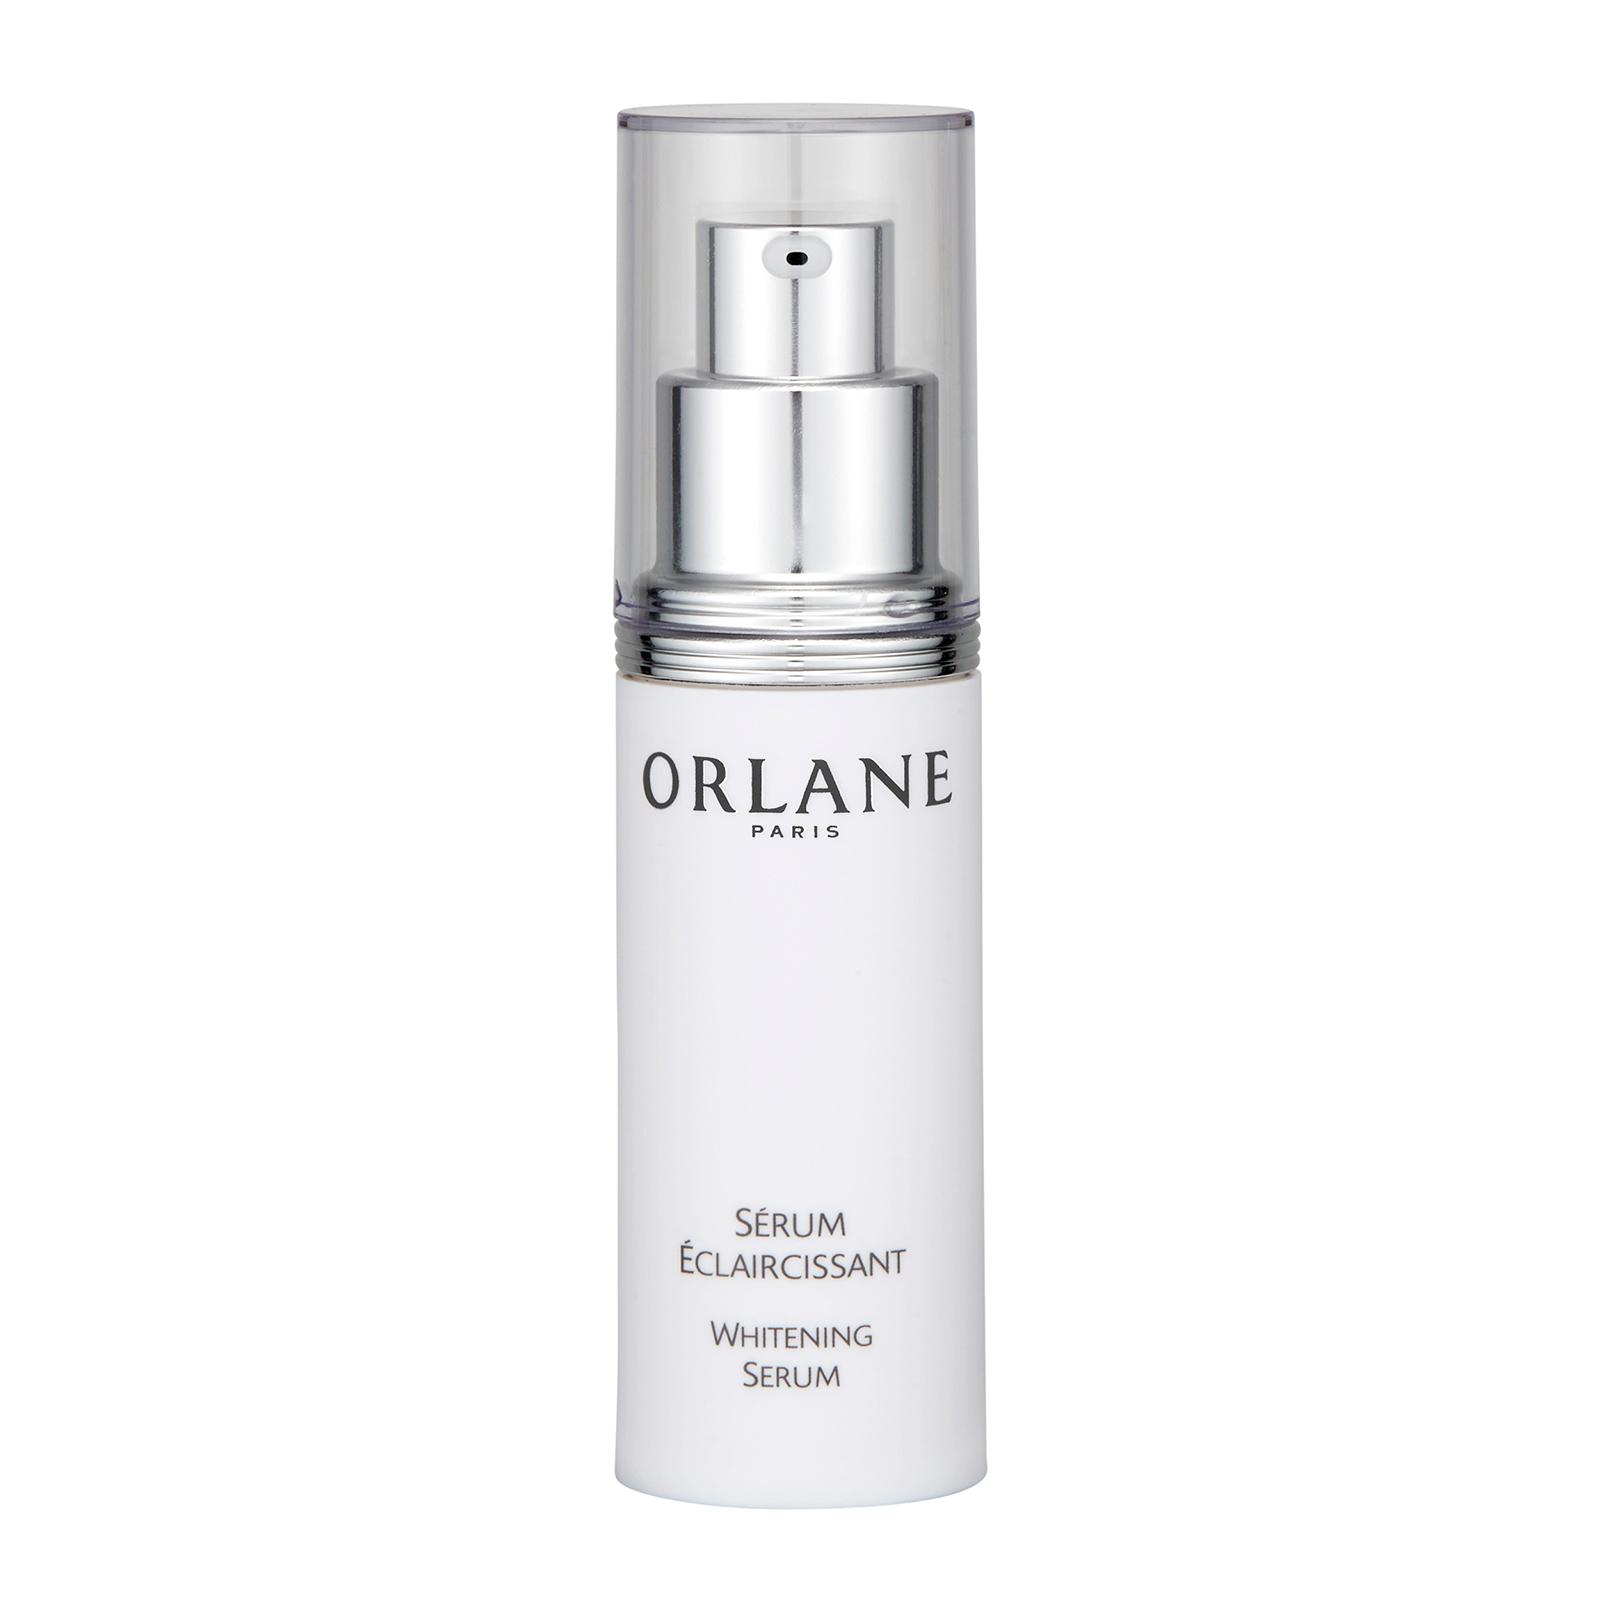 Orlane  Whitening Serum 1oz, 30ml